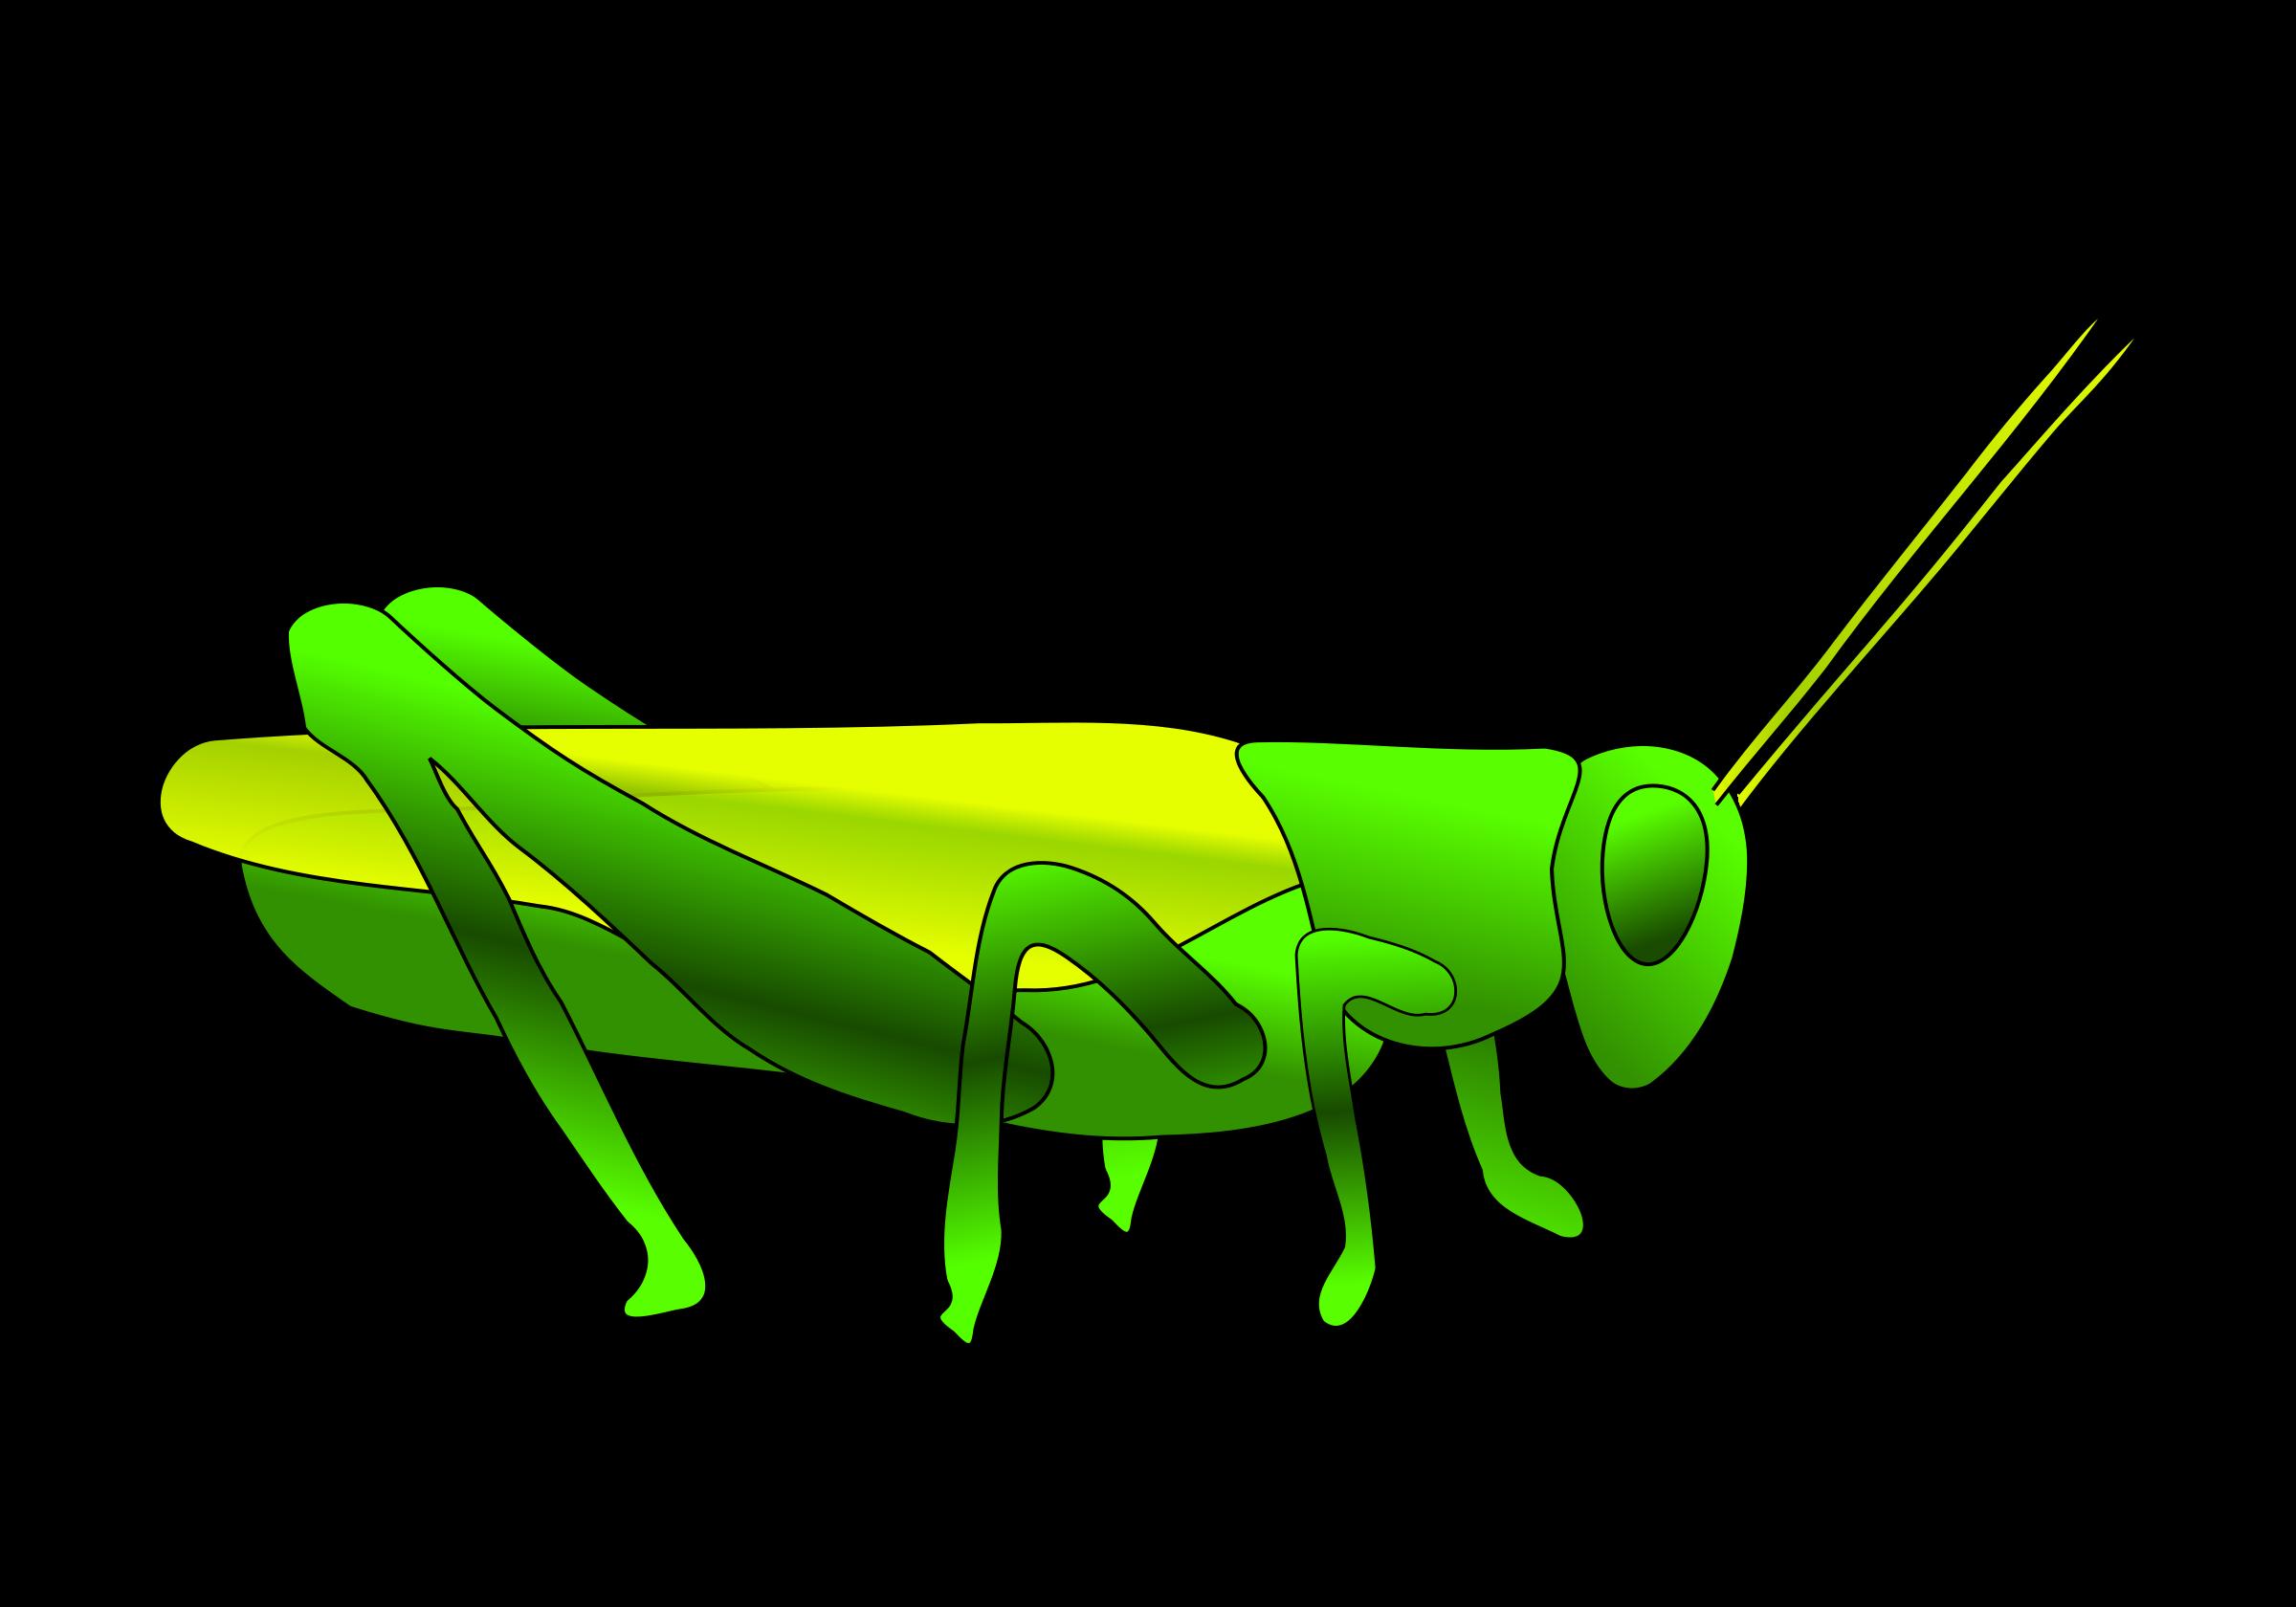 Free download best on. Bugs clipart grass hopper